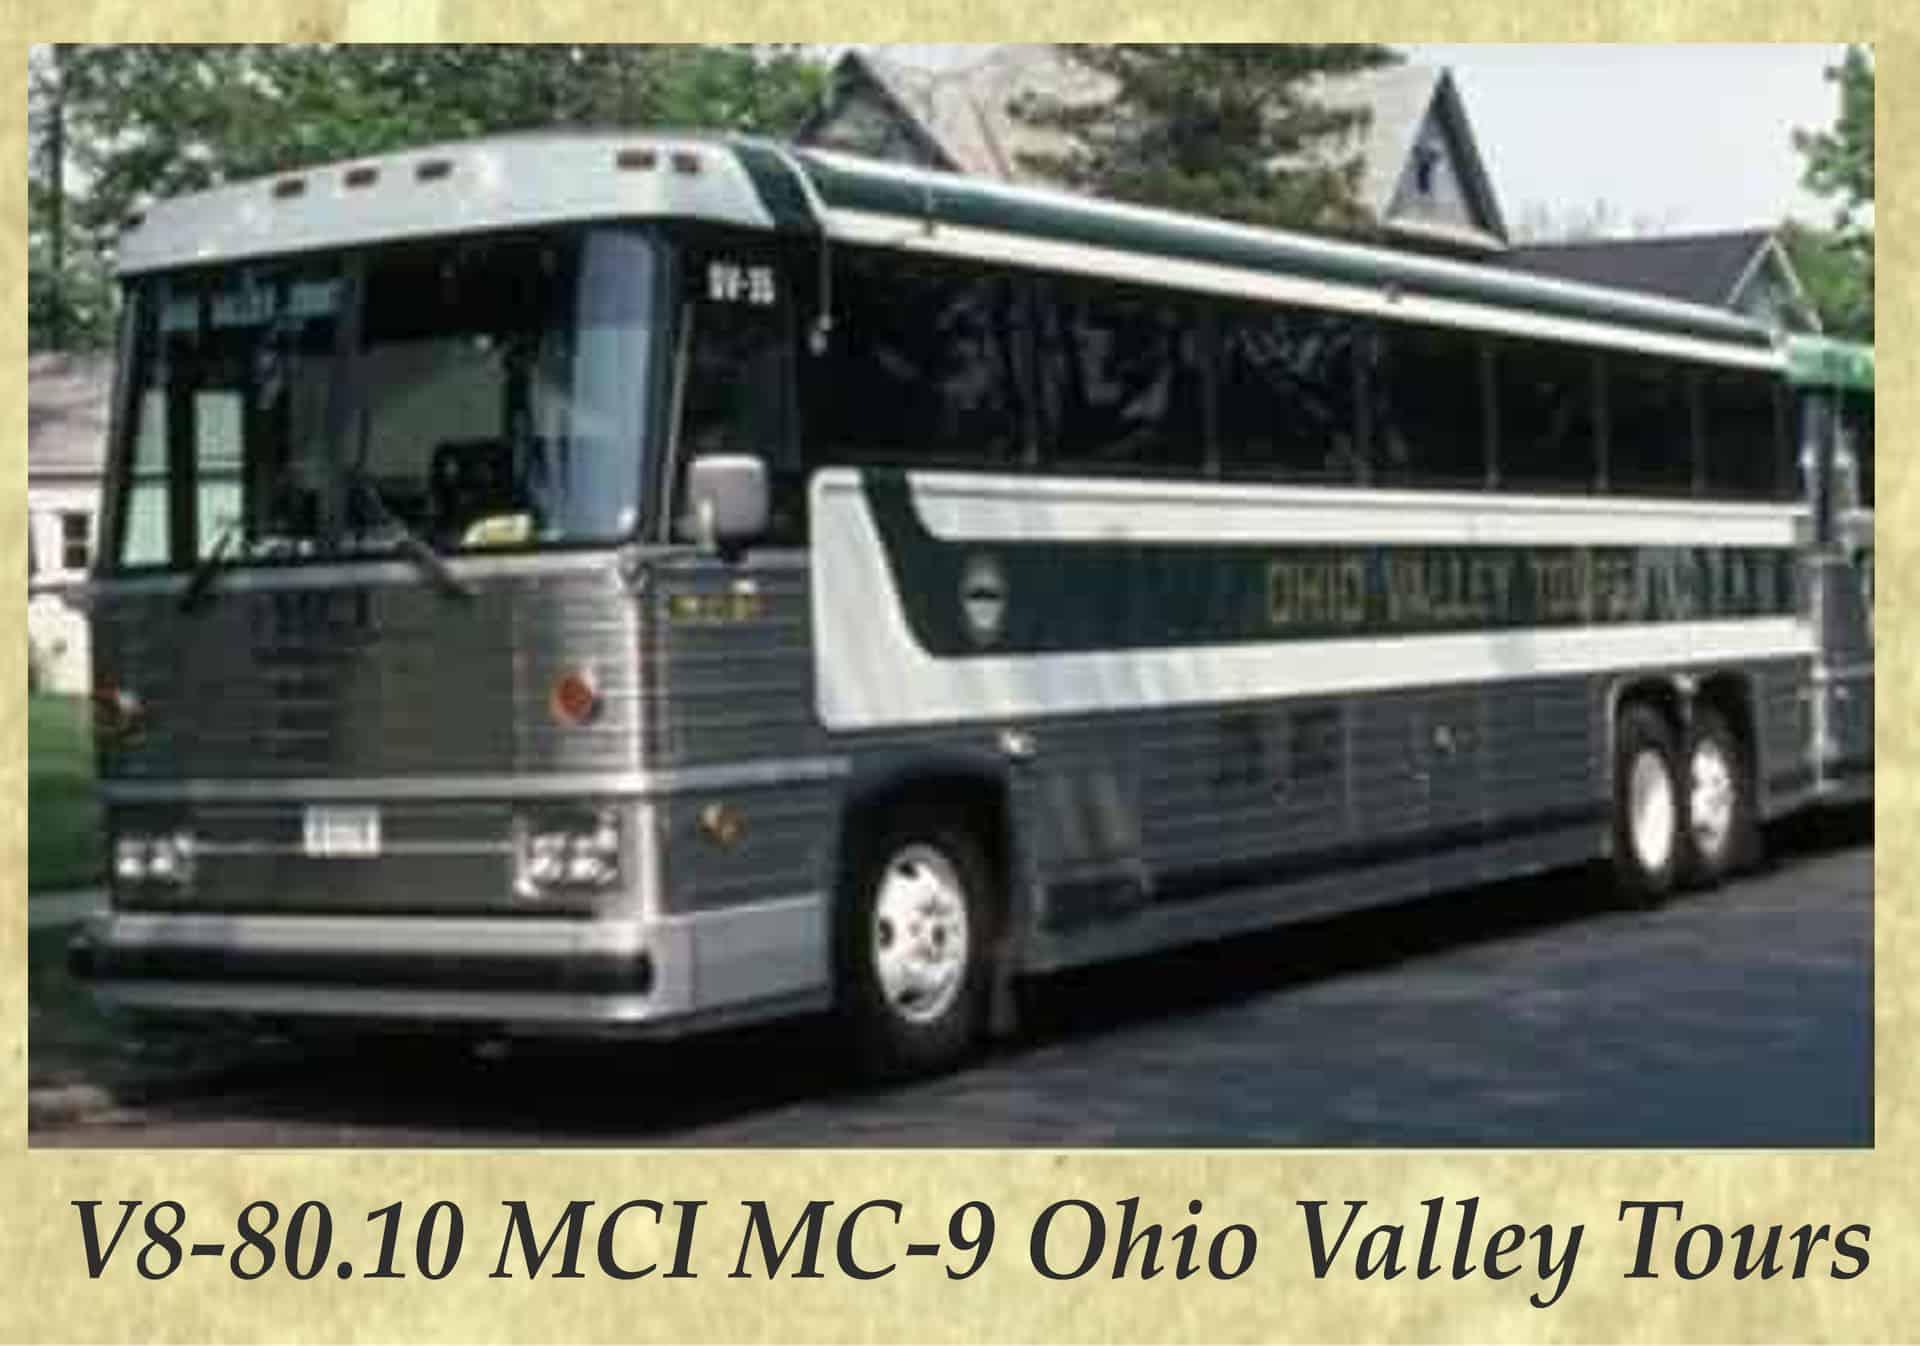 V8-80.10 MCI MC-9 Ohio Valley Tours